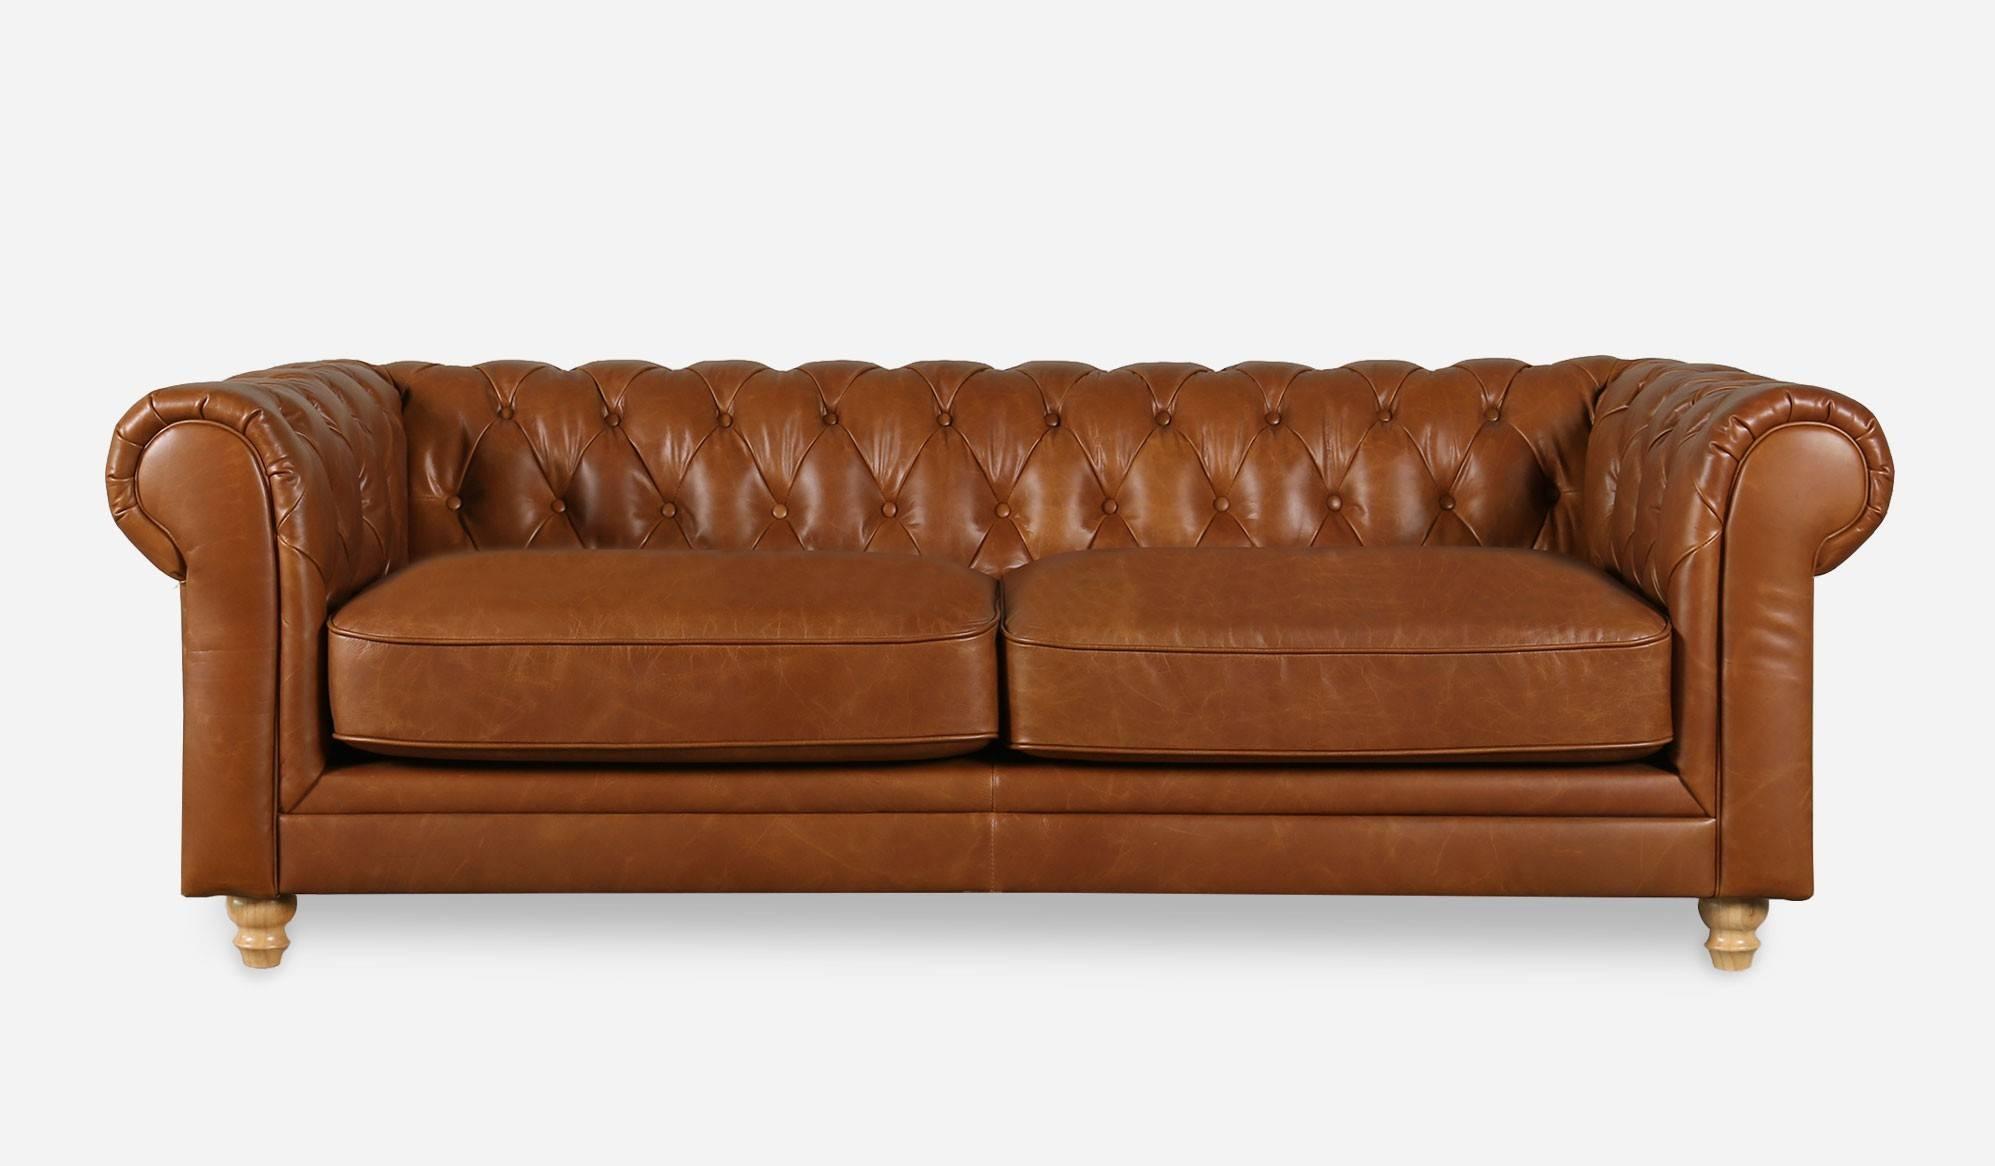 Sofas Center : Impressive Chesterfield Sofa Leather Image In Leather Chesterfield Sofas (Image 23 of 30)